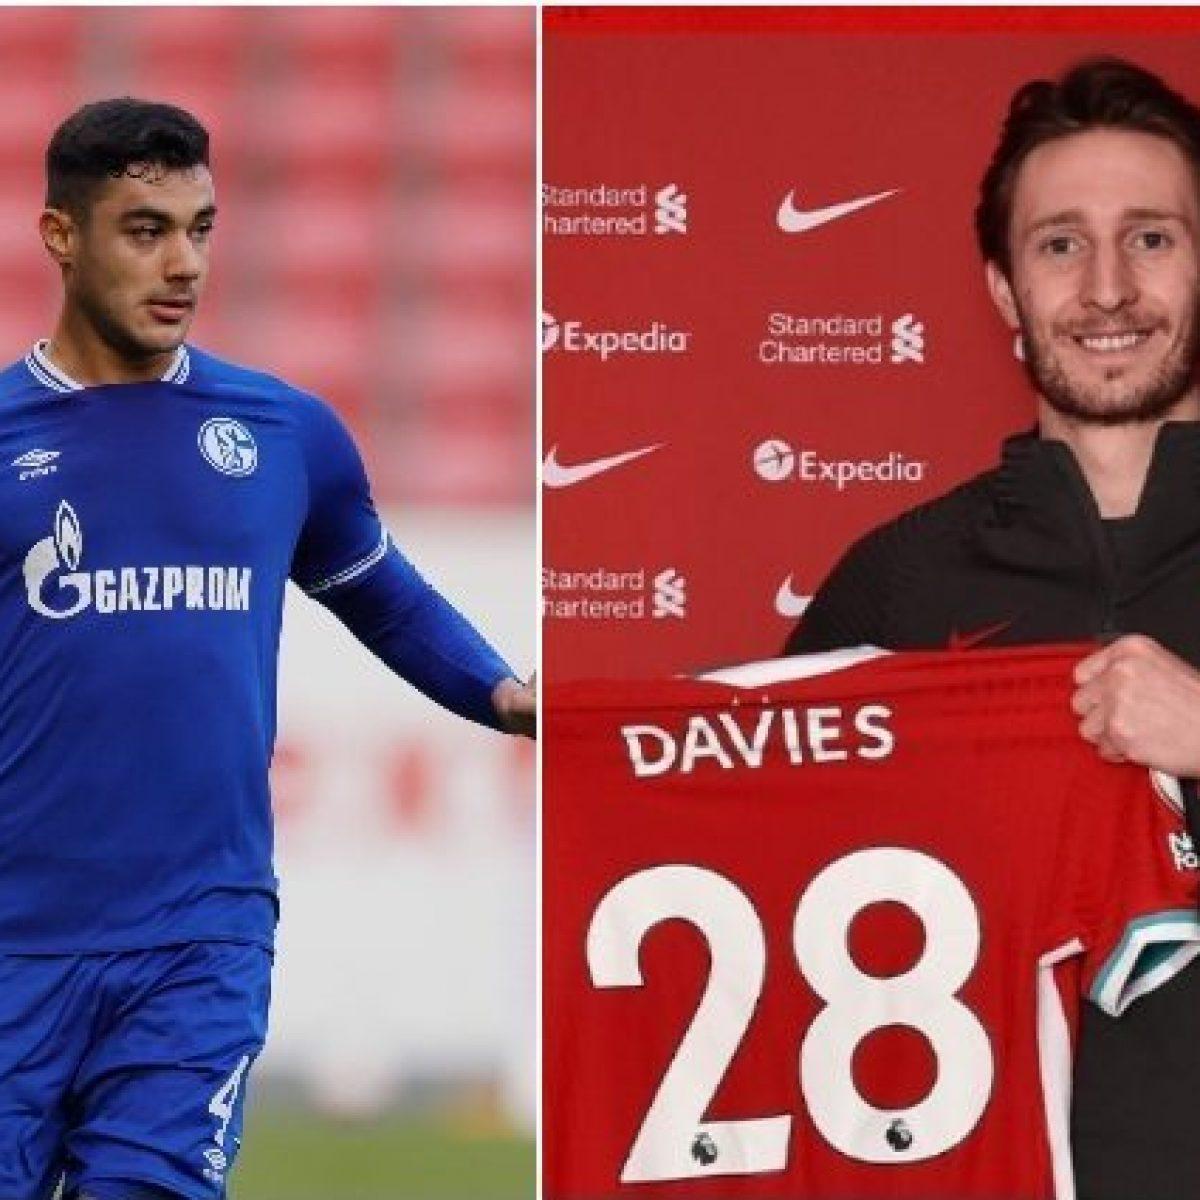 Kabak e Ben Davies al Liverpool, Klopp rinforza la difesa con due ...